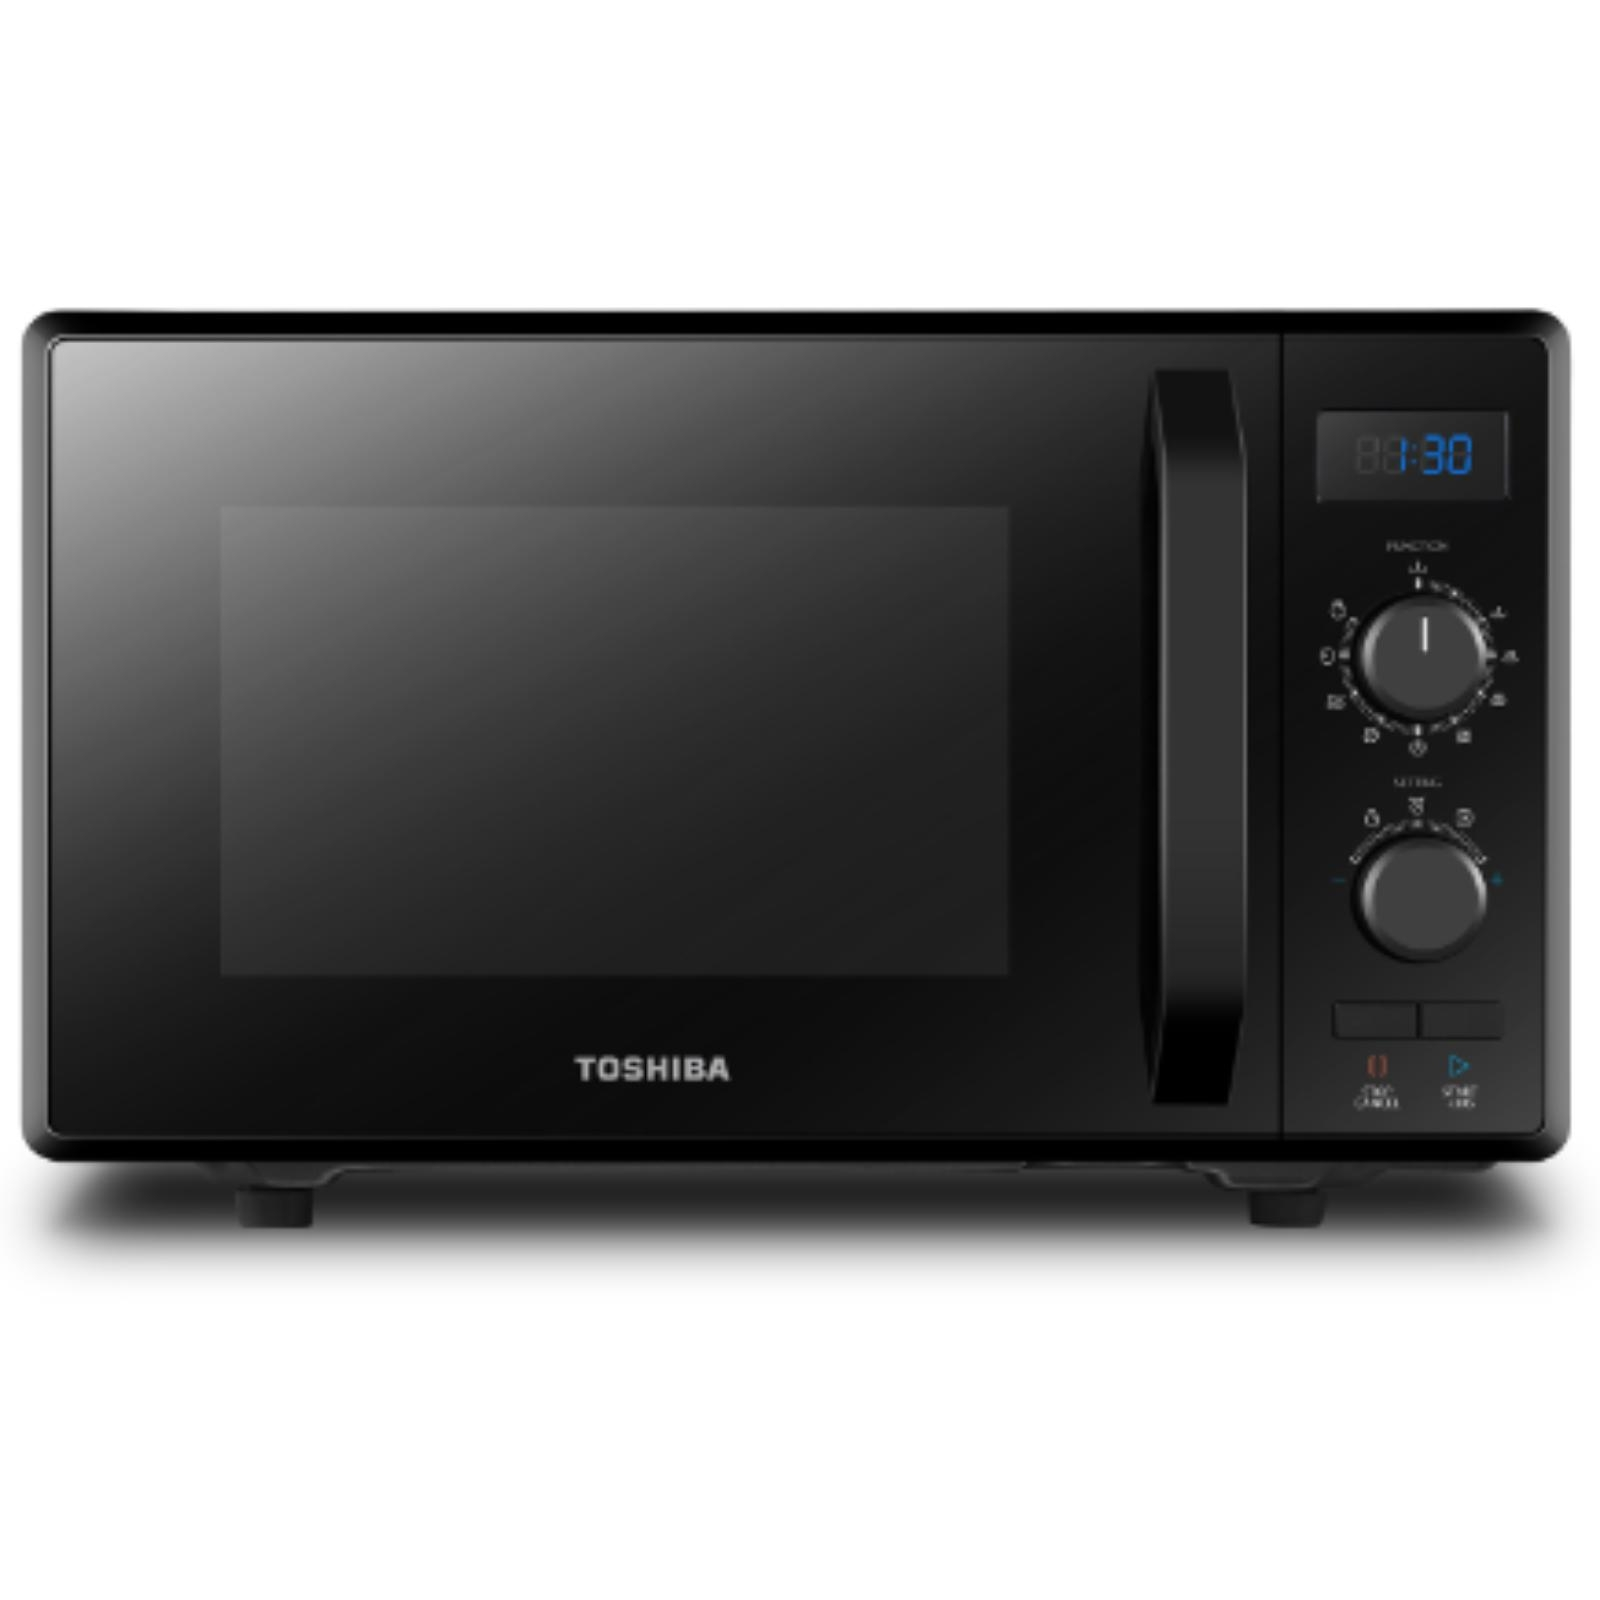 Cuptor cu microunde Toshiba MW2-MM20PBK, volum 20 L, control mecanic, 800 W, 5 nivele putere, iluminare LED, Negru